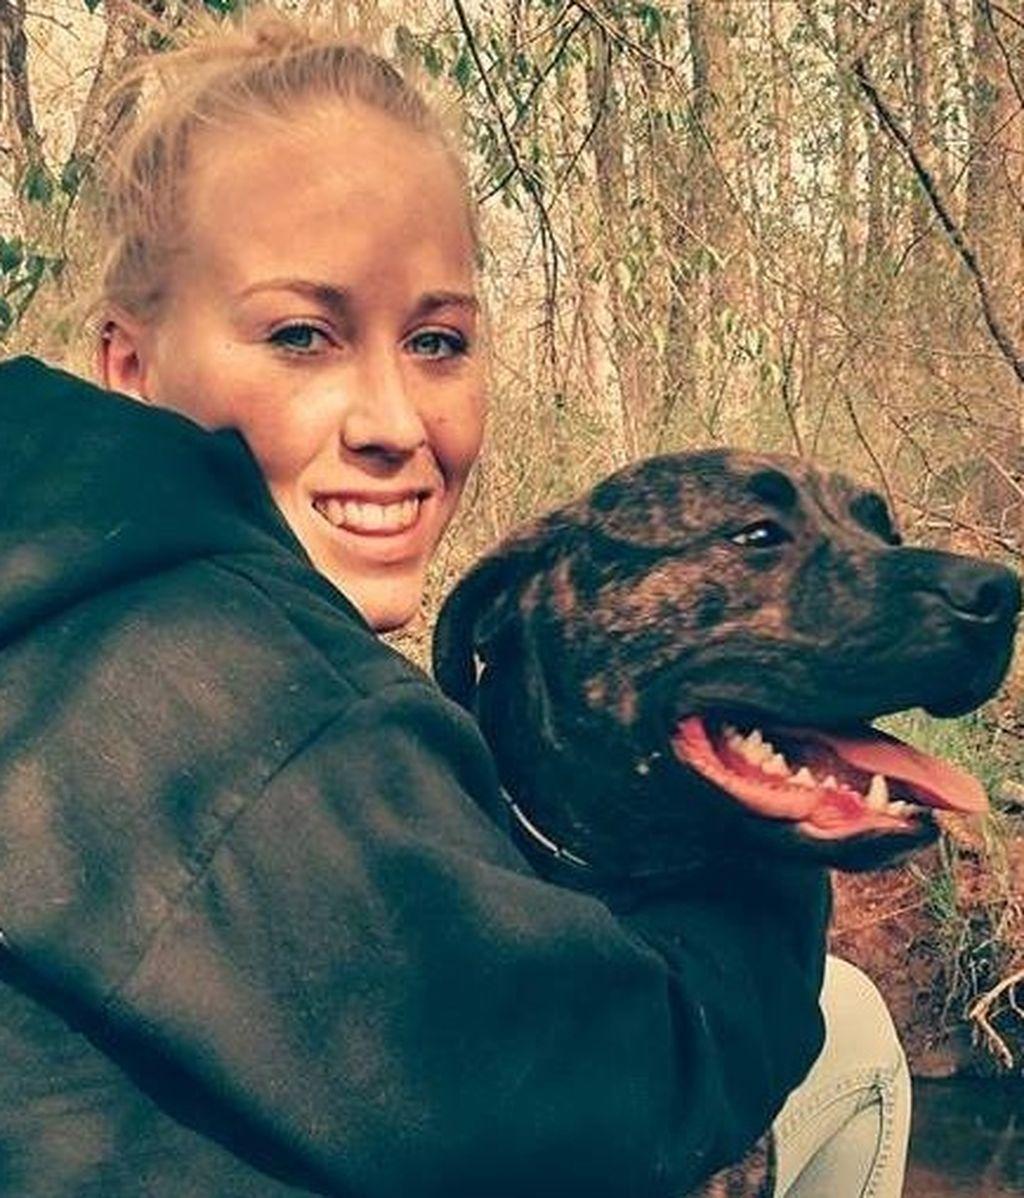 Bethany Lynn Stephens posando con uno de sus pitbulls